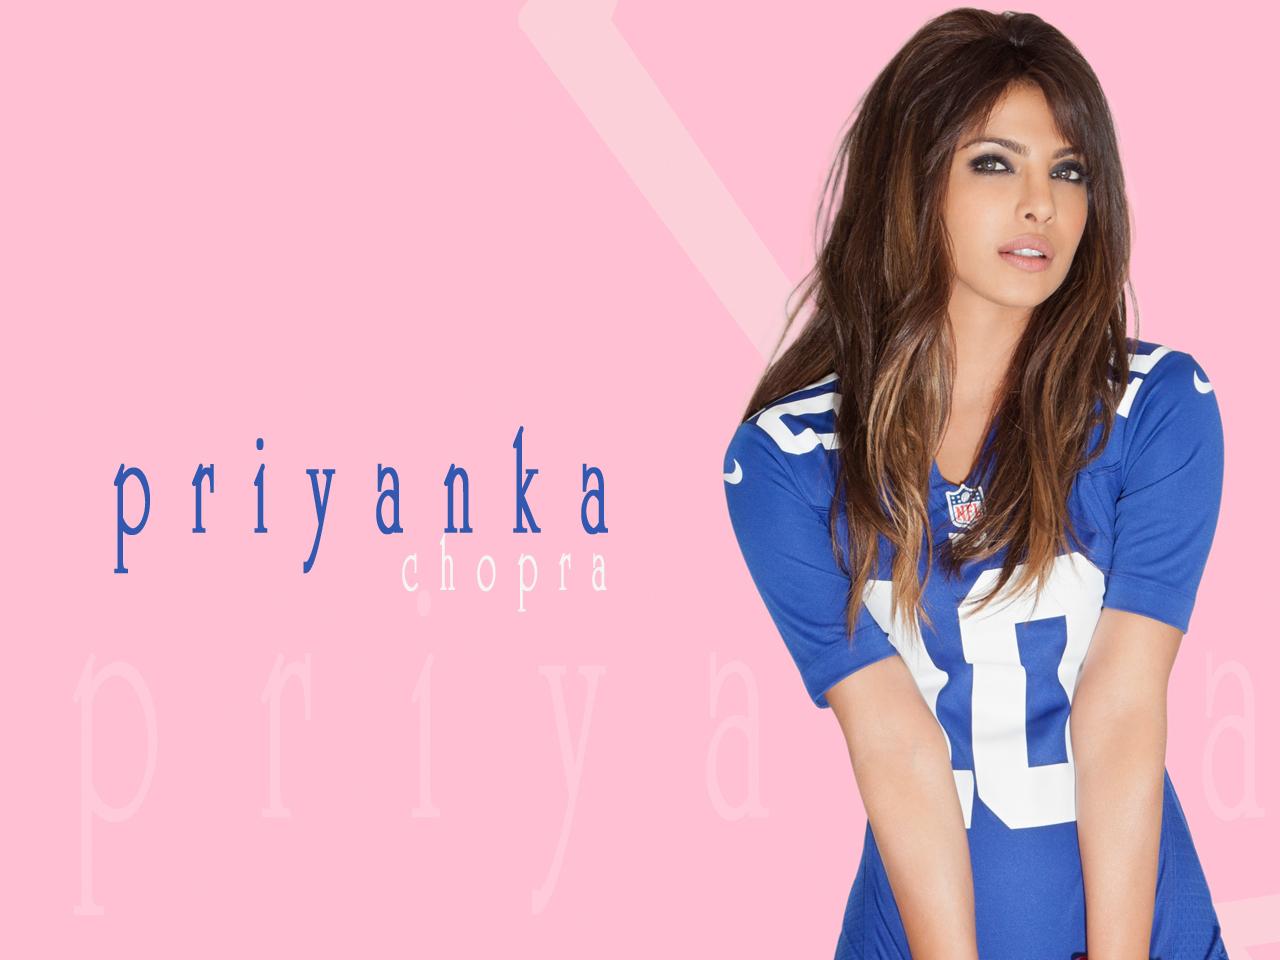 Priyanka chopra actress cute photos